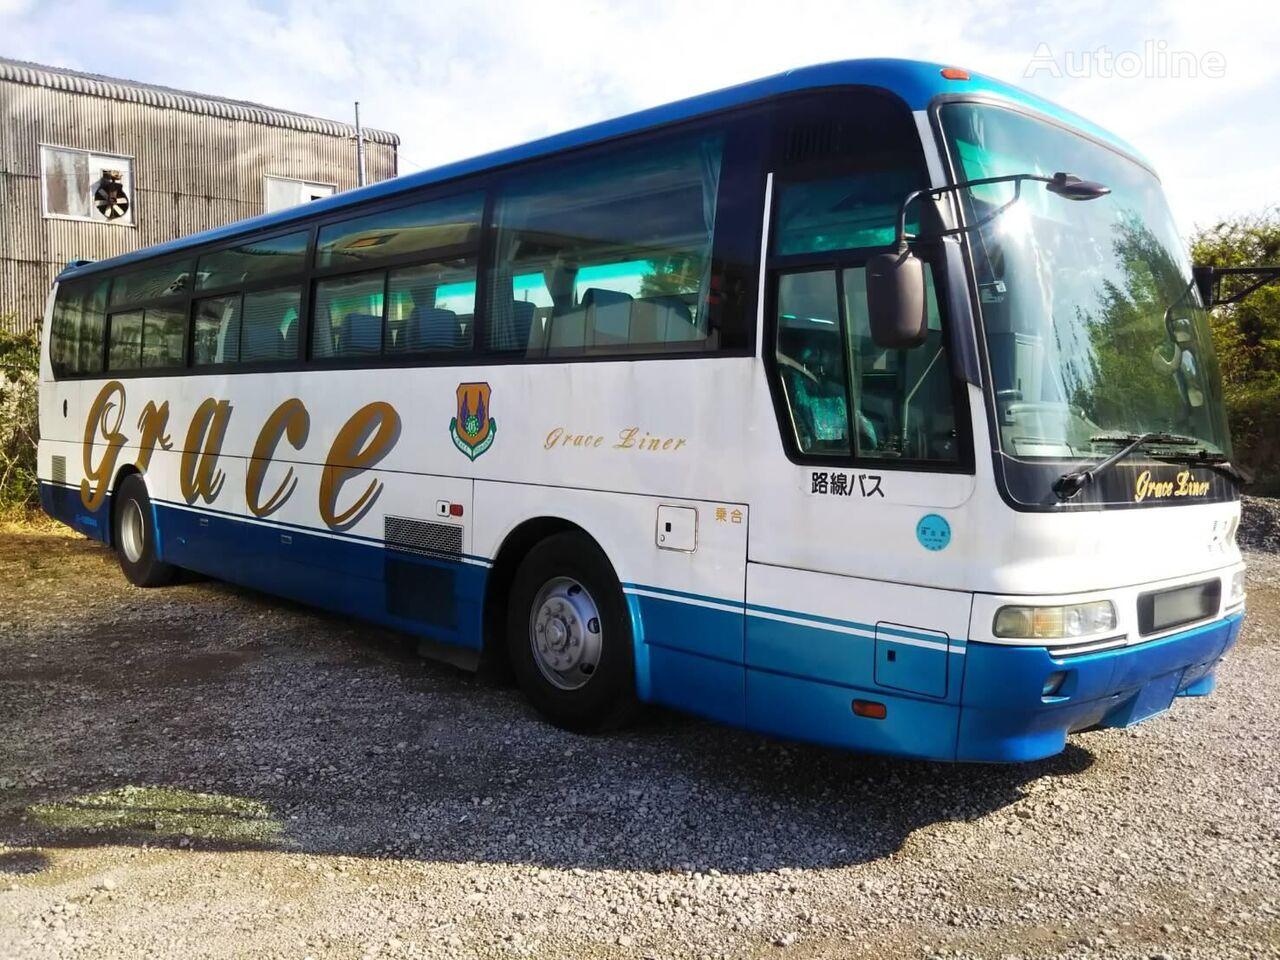 MITSUBISHI coach bus